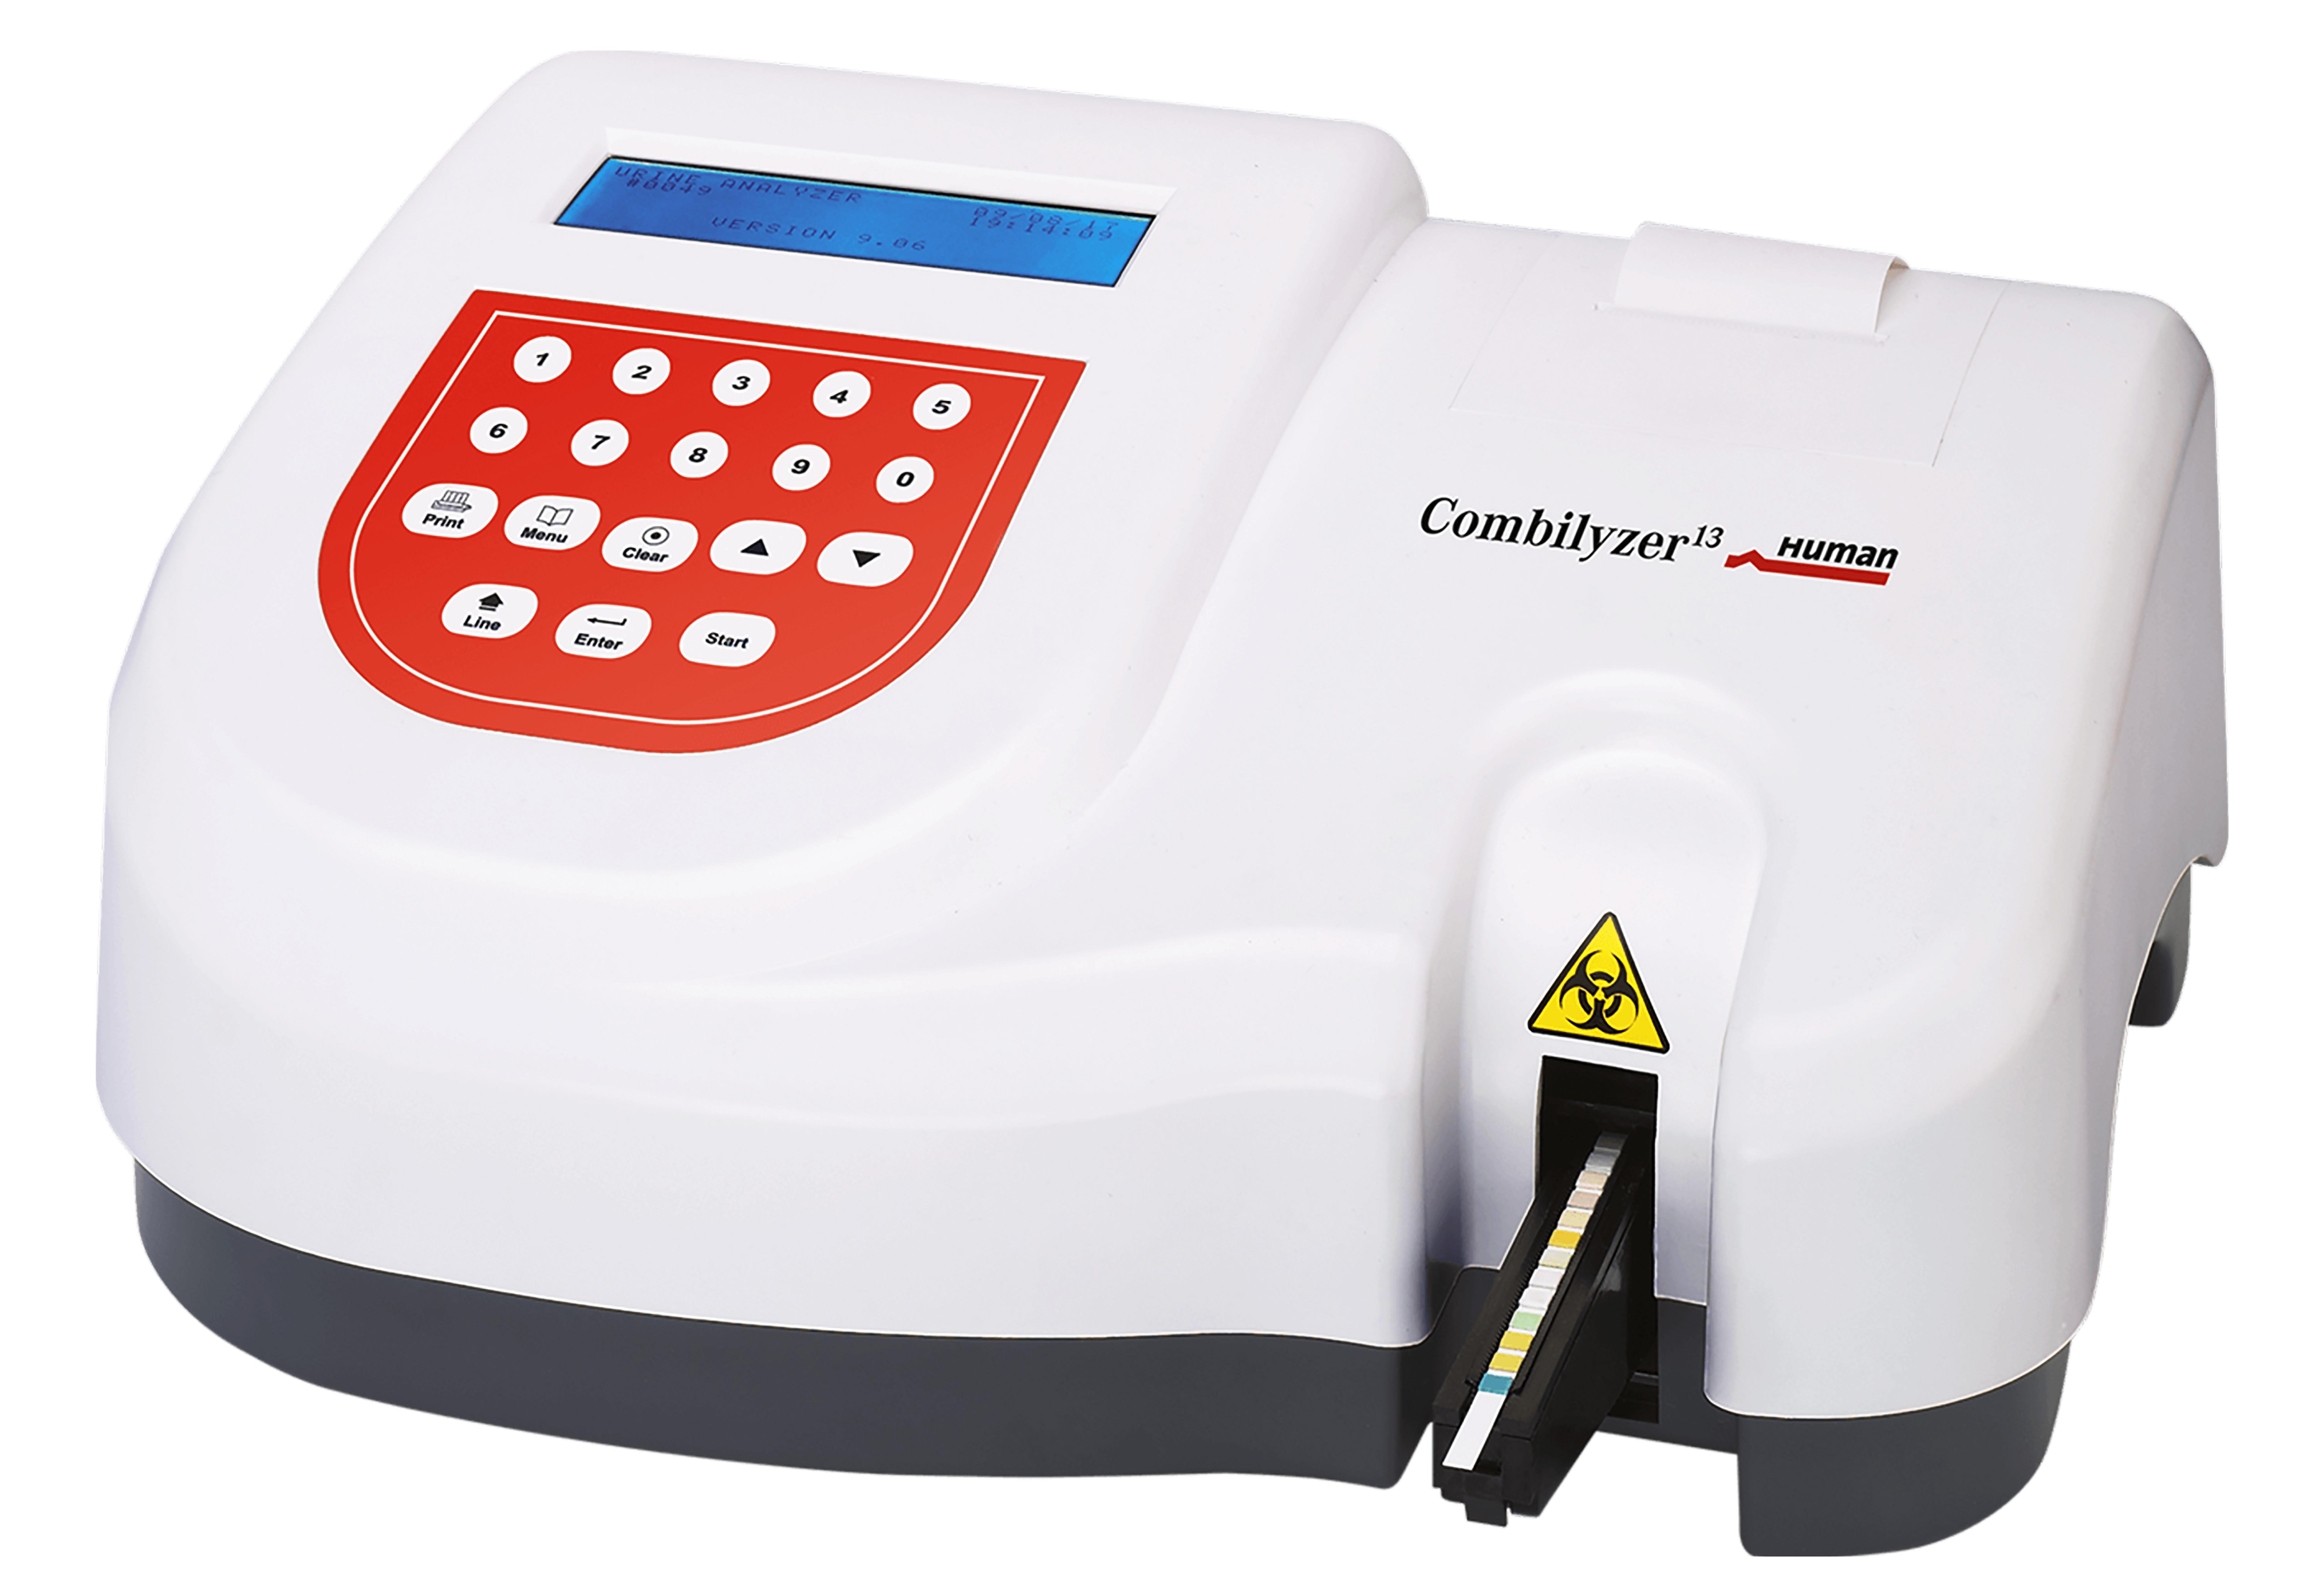 Combilyzer 13 Анализатор мочи для клинического анализа по 13 параметрам